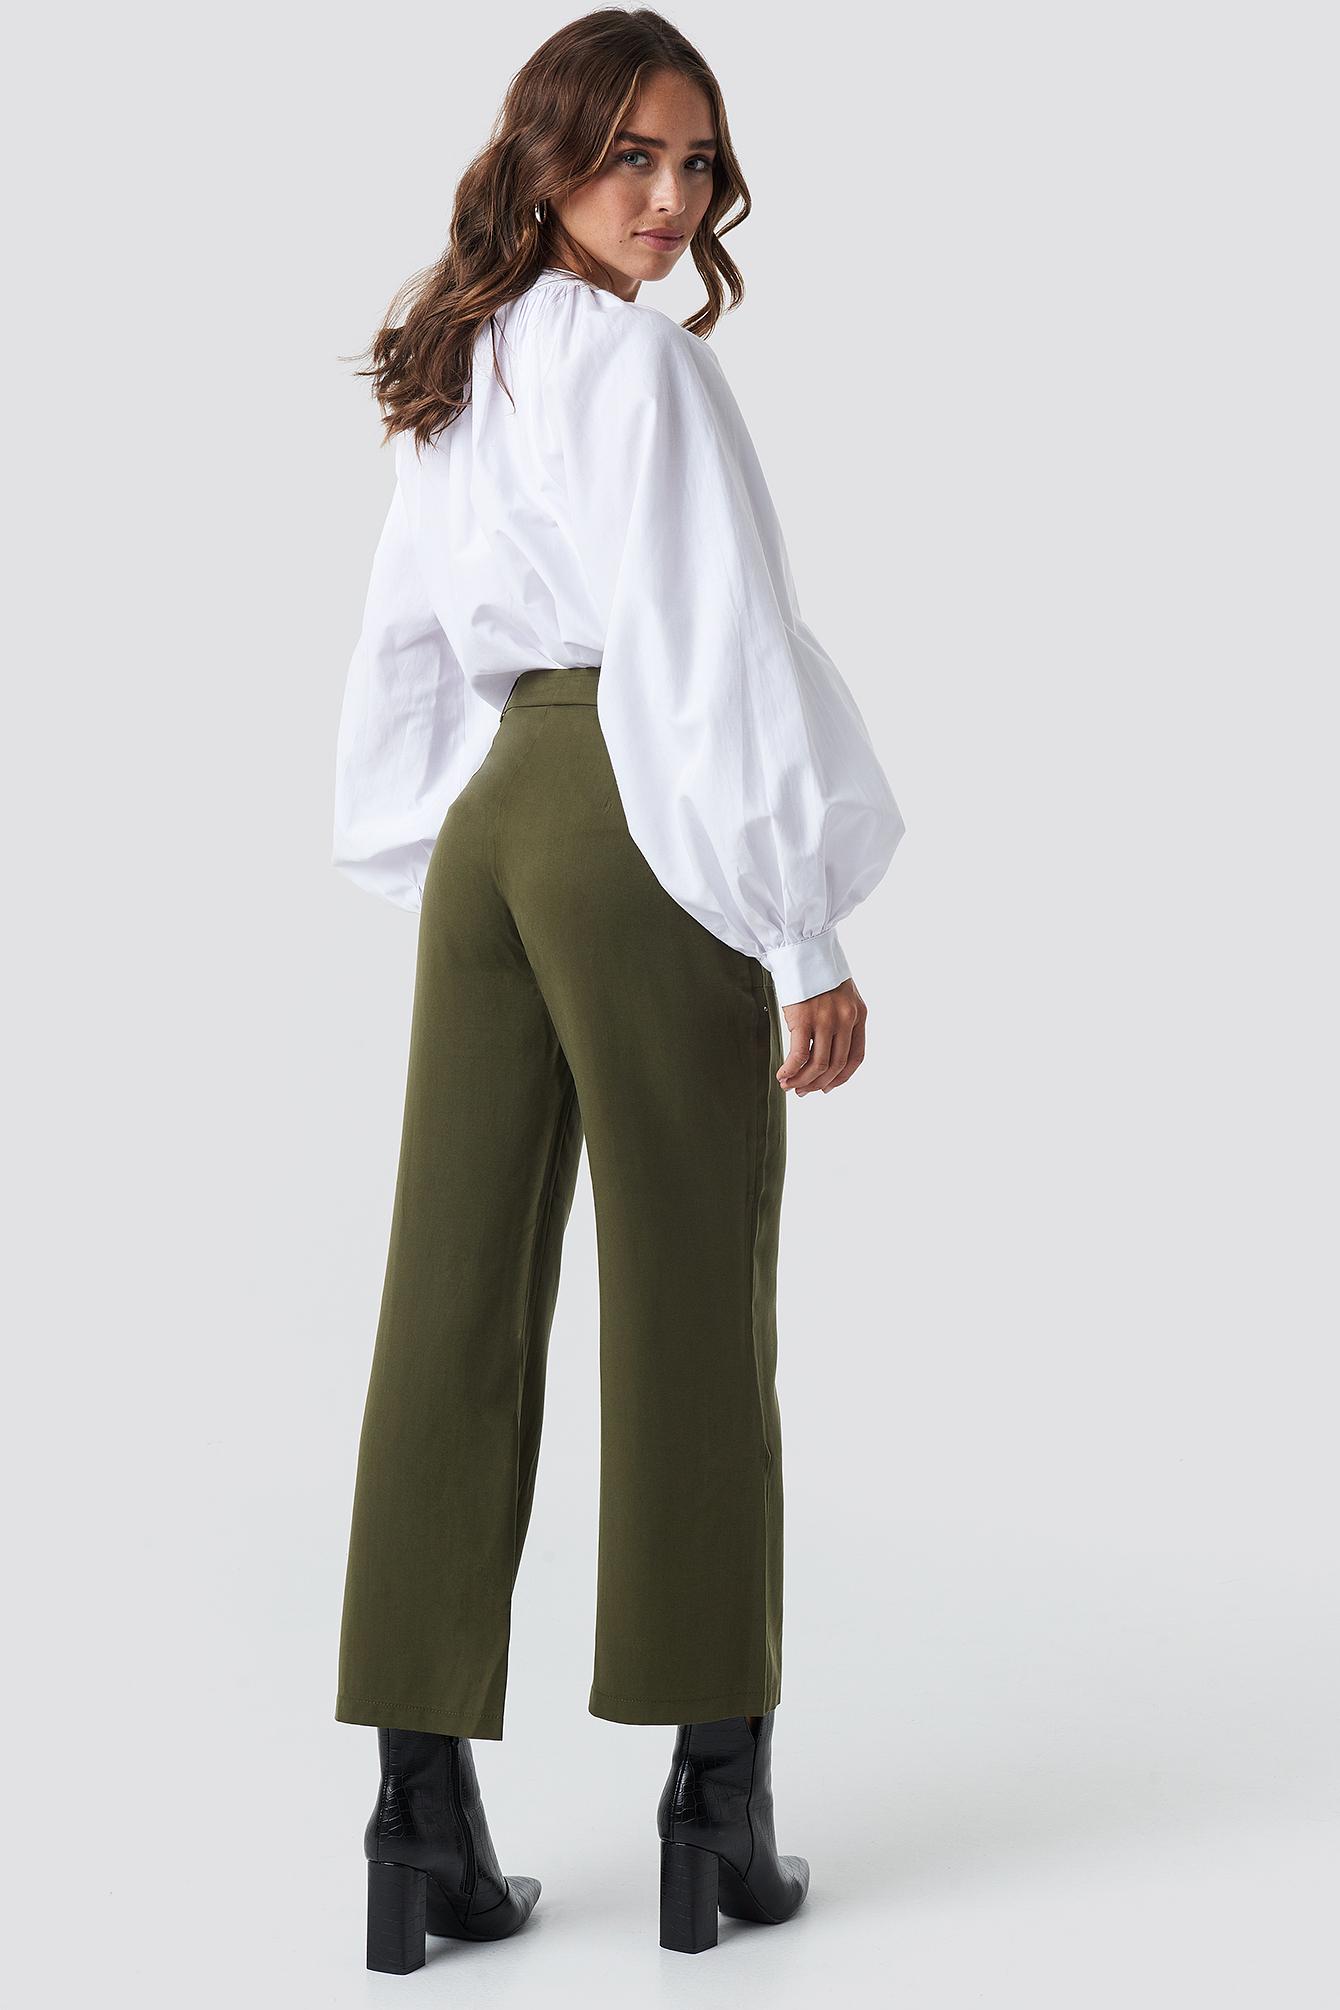 Pocket Detailed Pants NA-KD.COM